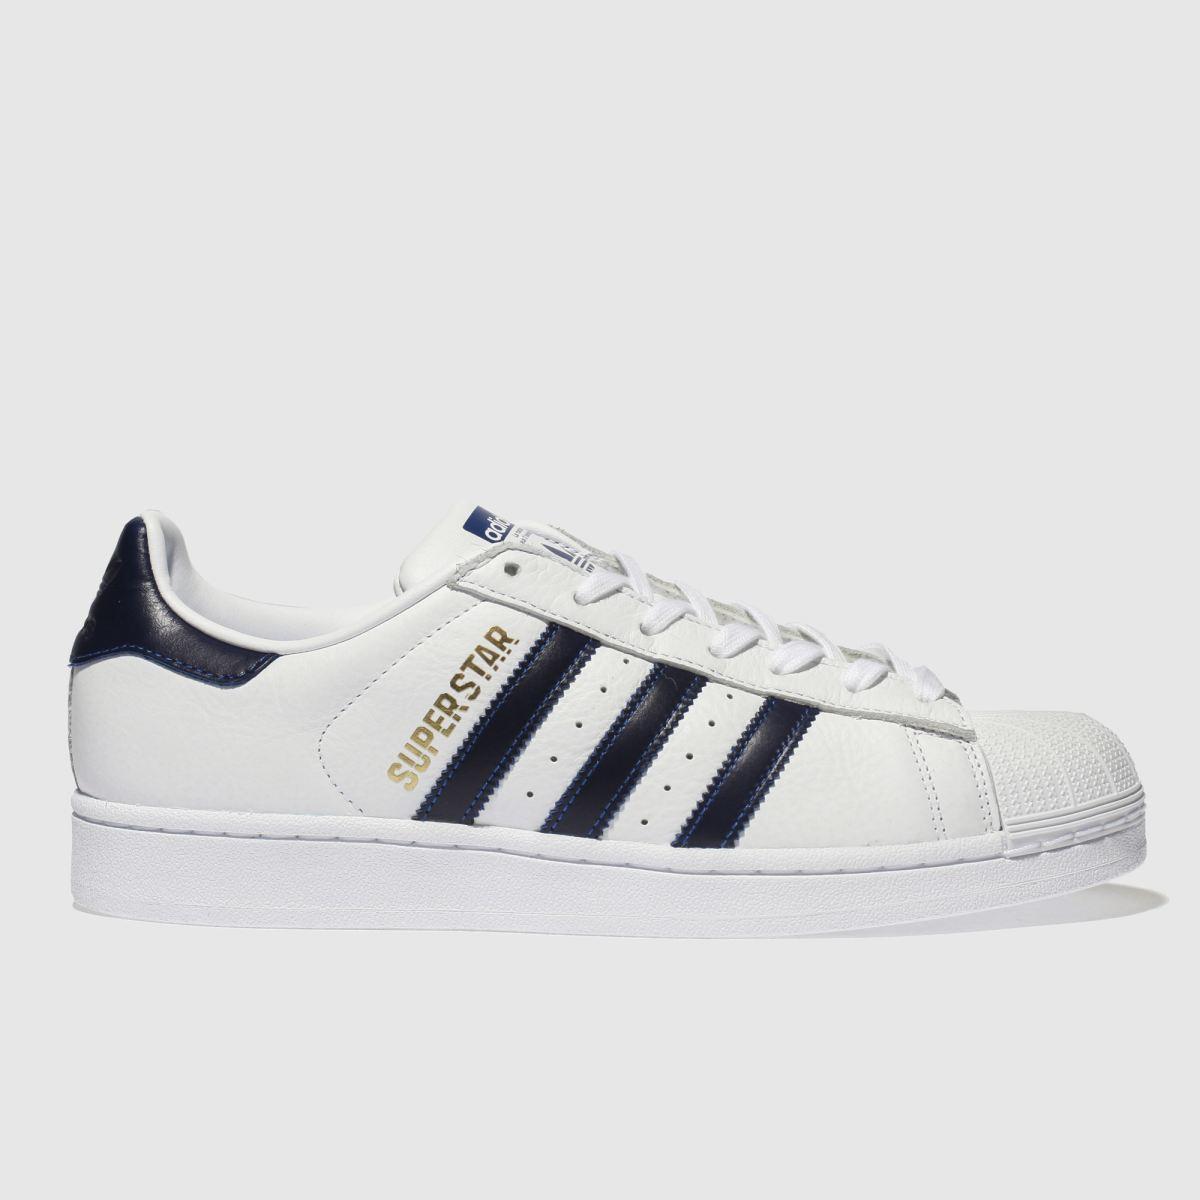 Adidas White & Navy Superstar Trainers